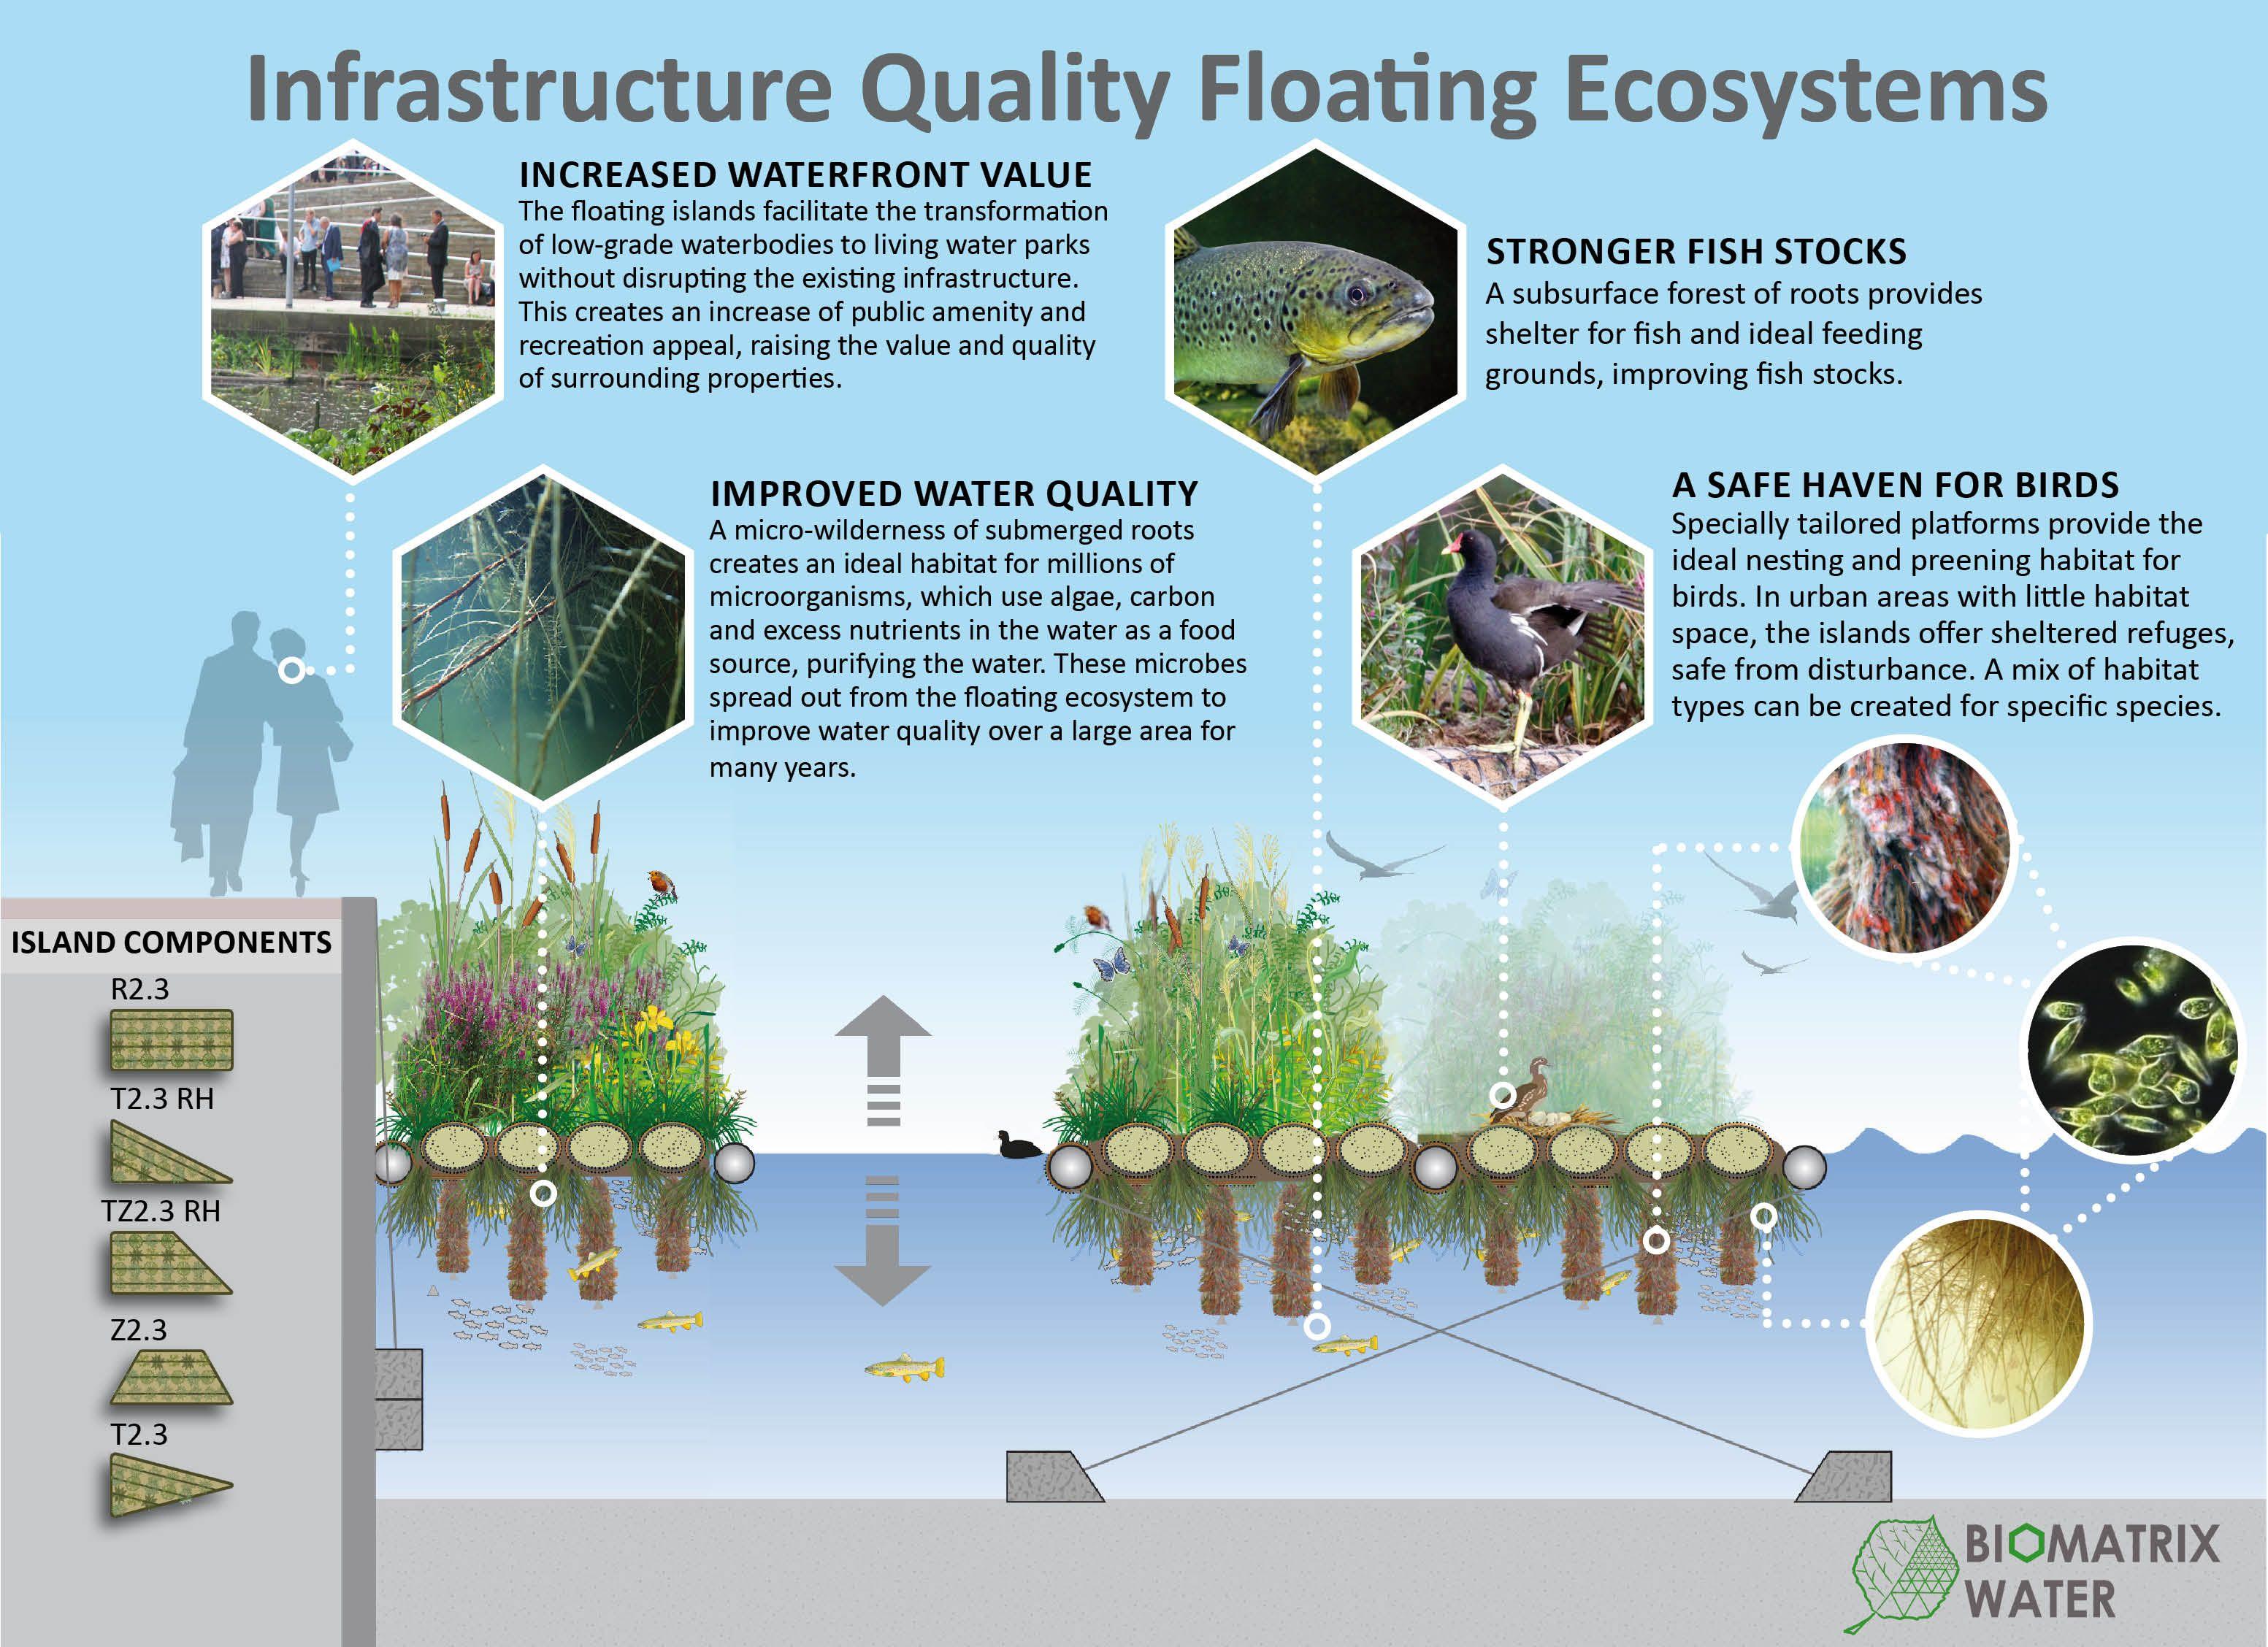 The Key Benefits Of Biomatrix Floating Ecosystems